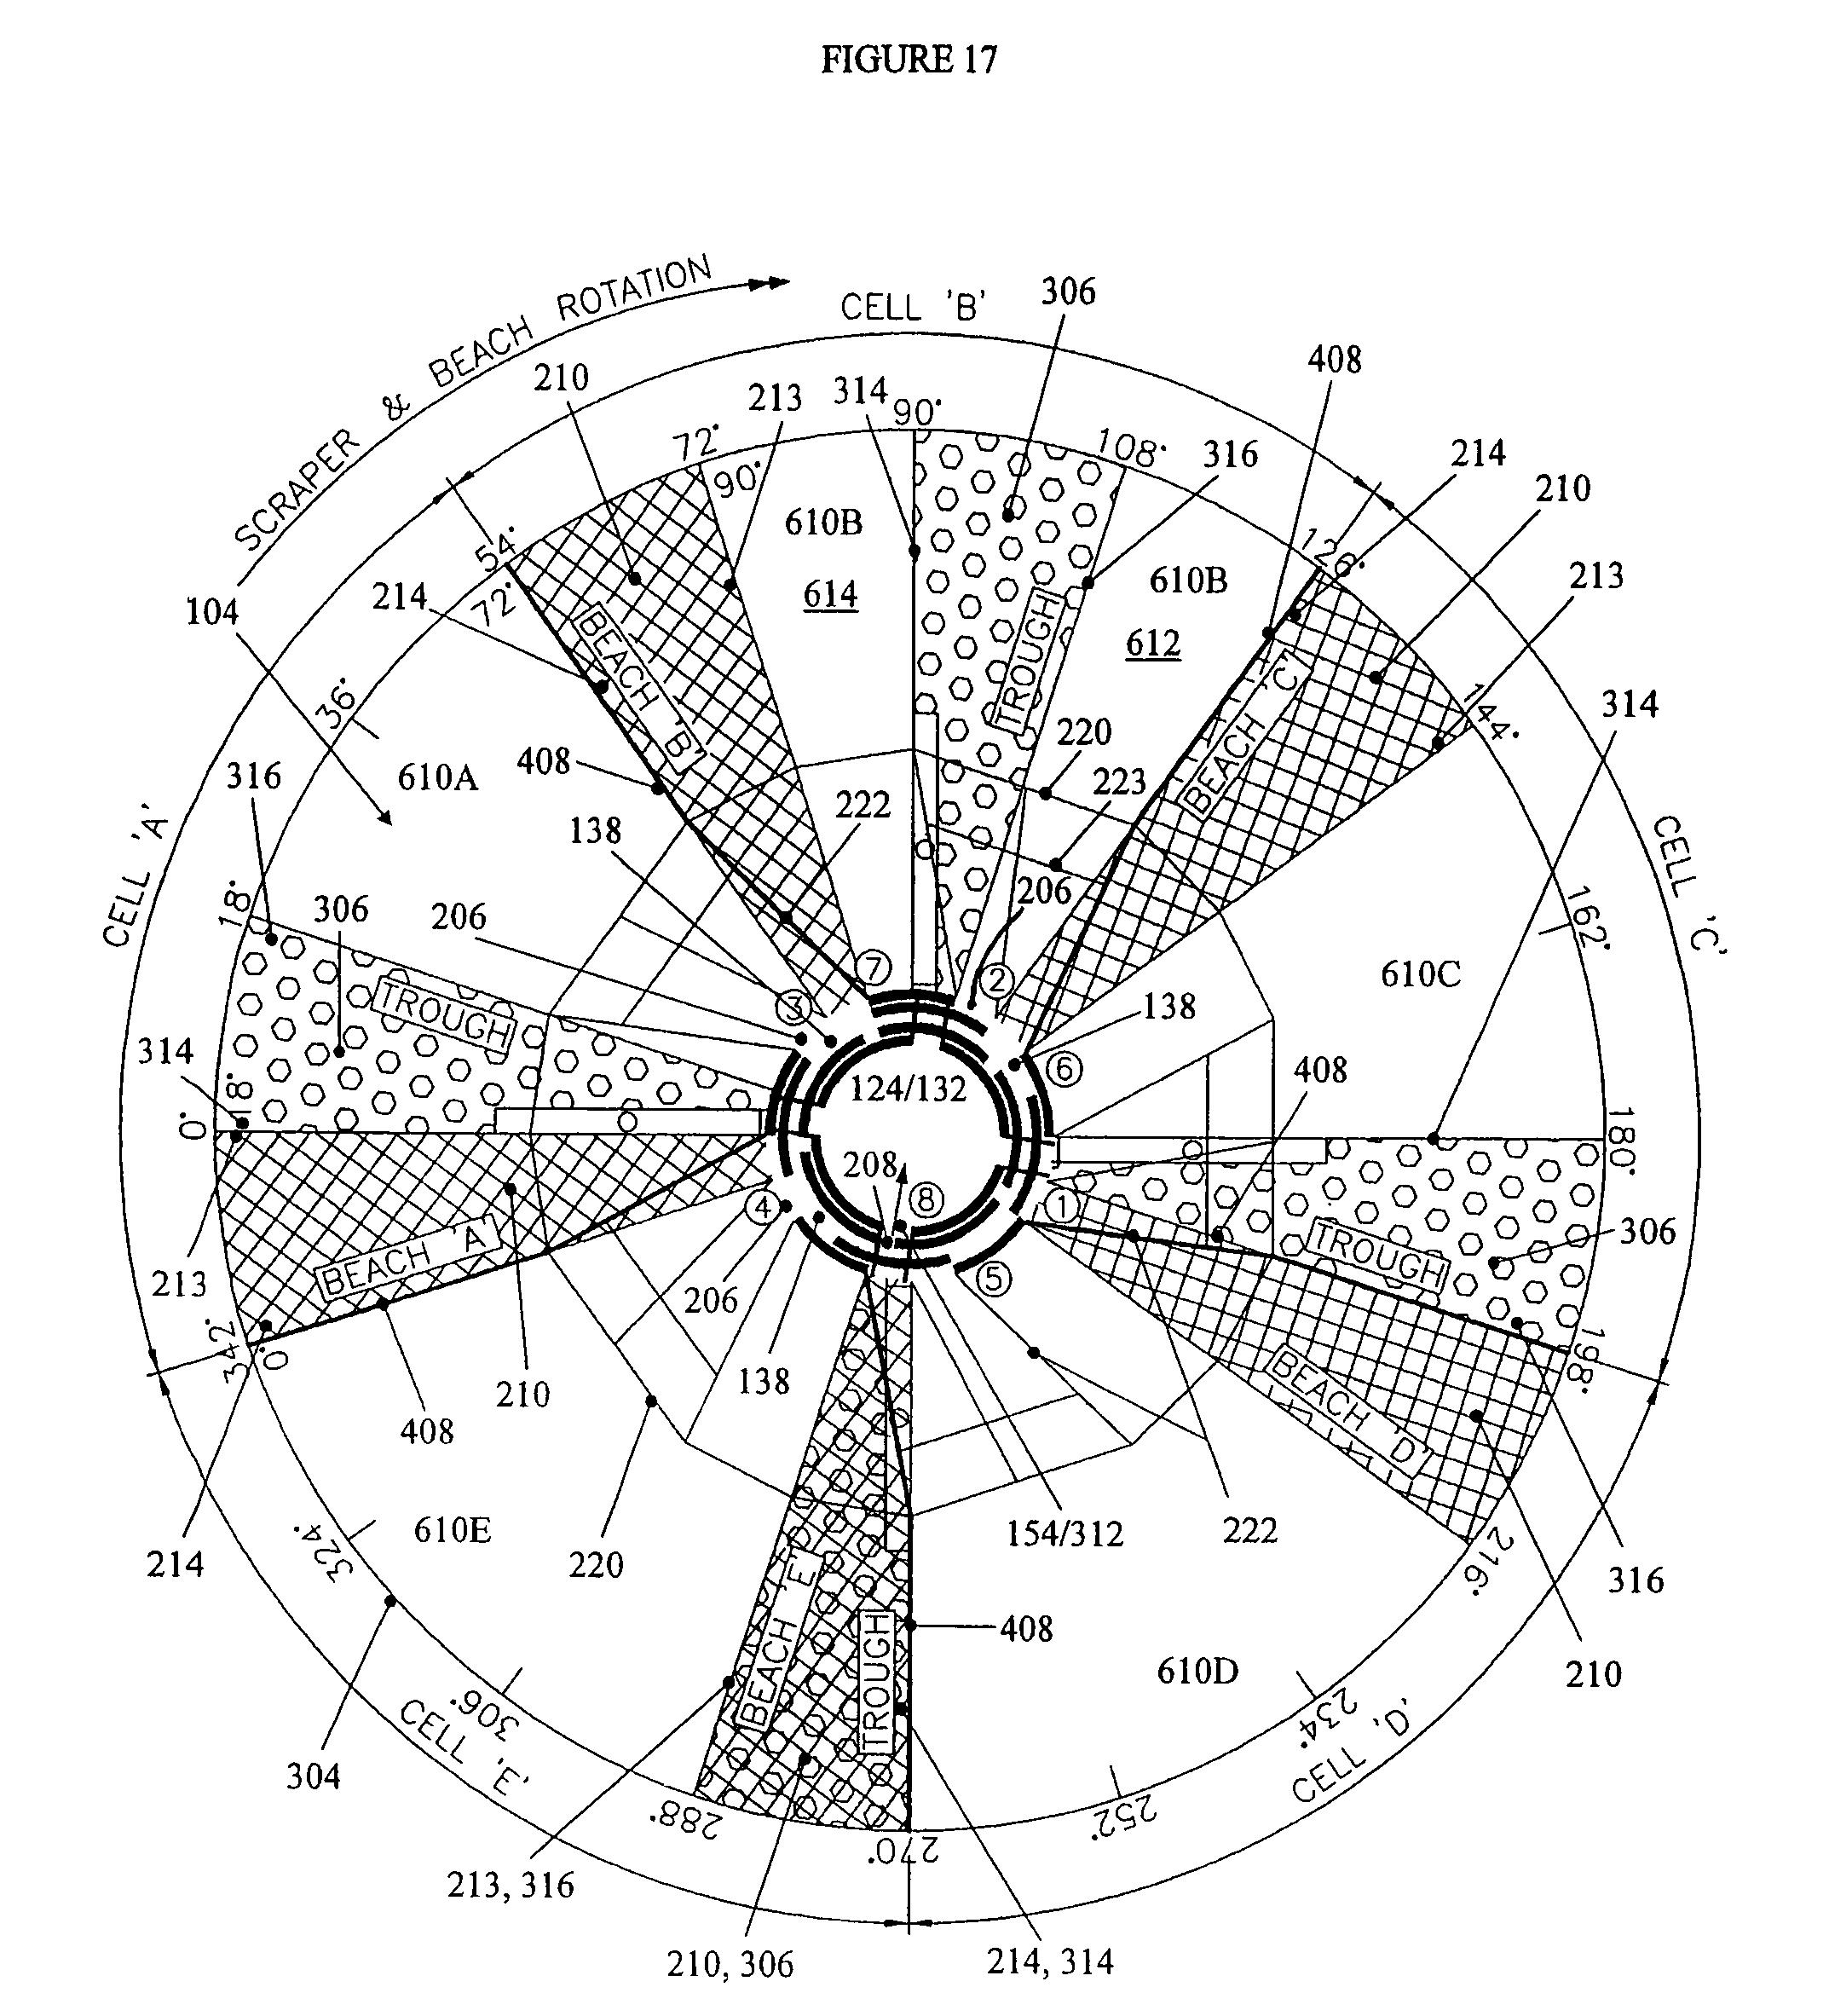 Amazing One Wire Alternator Conversion Frieze - The Wire - magnox.info